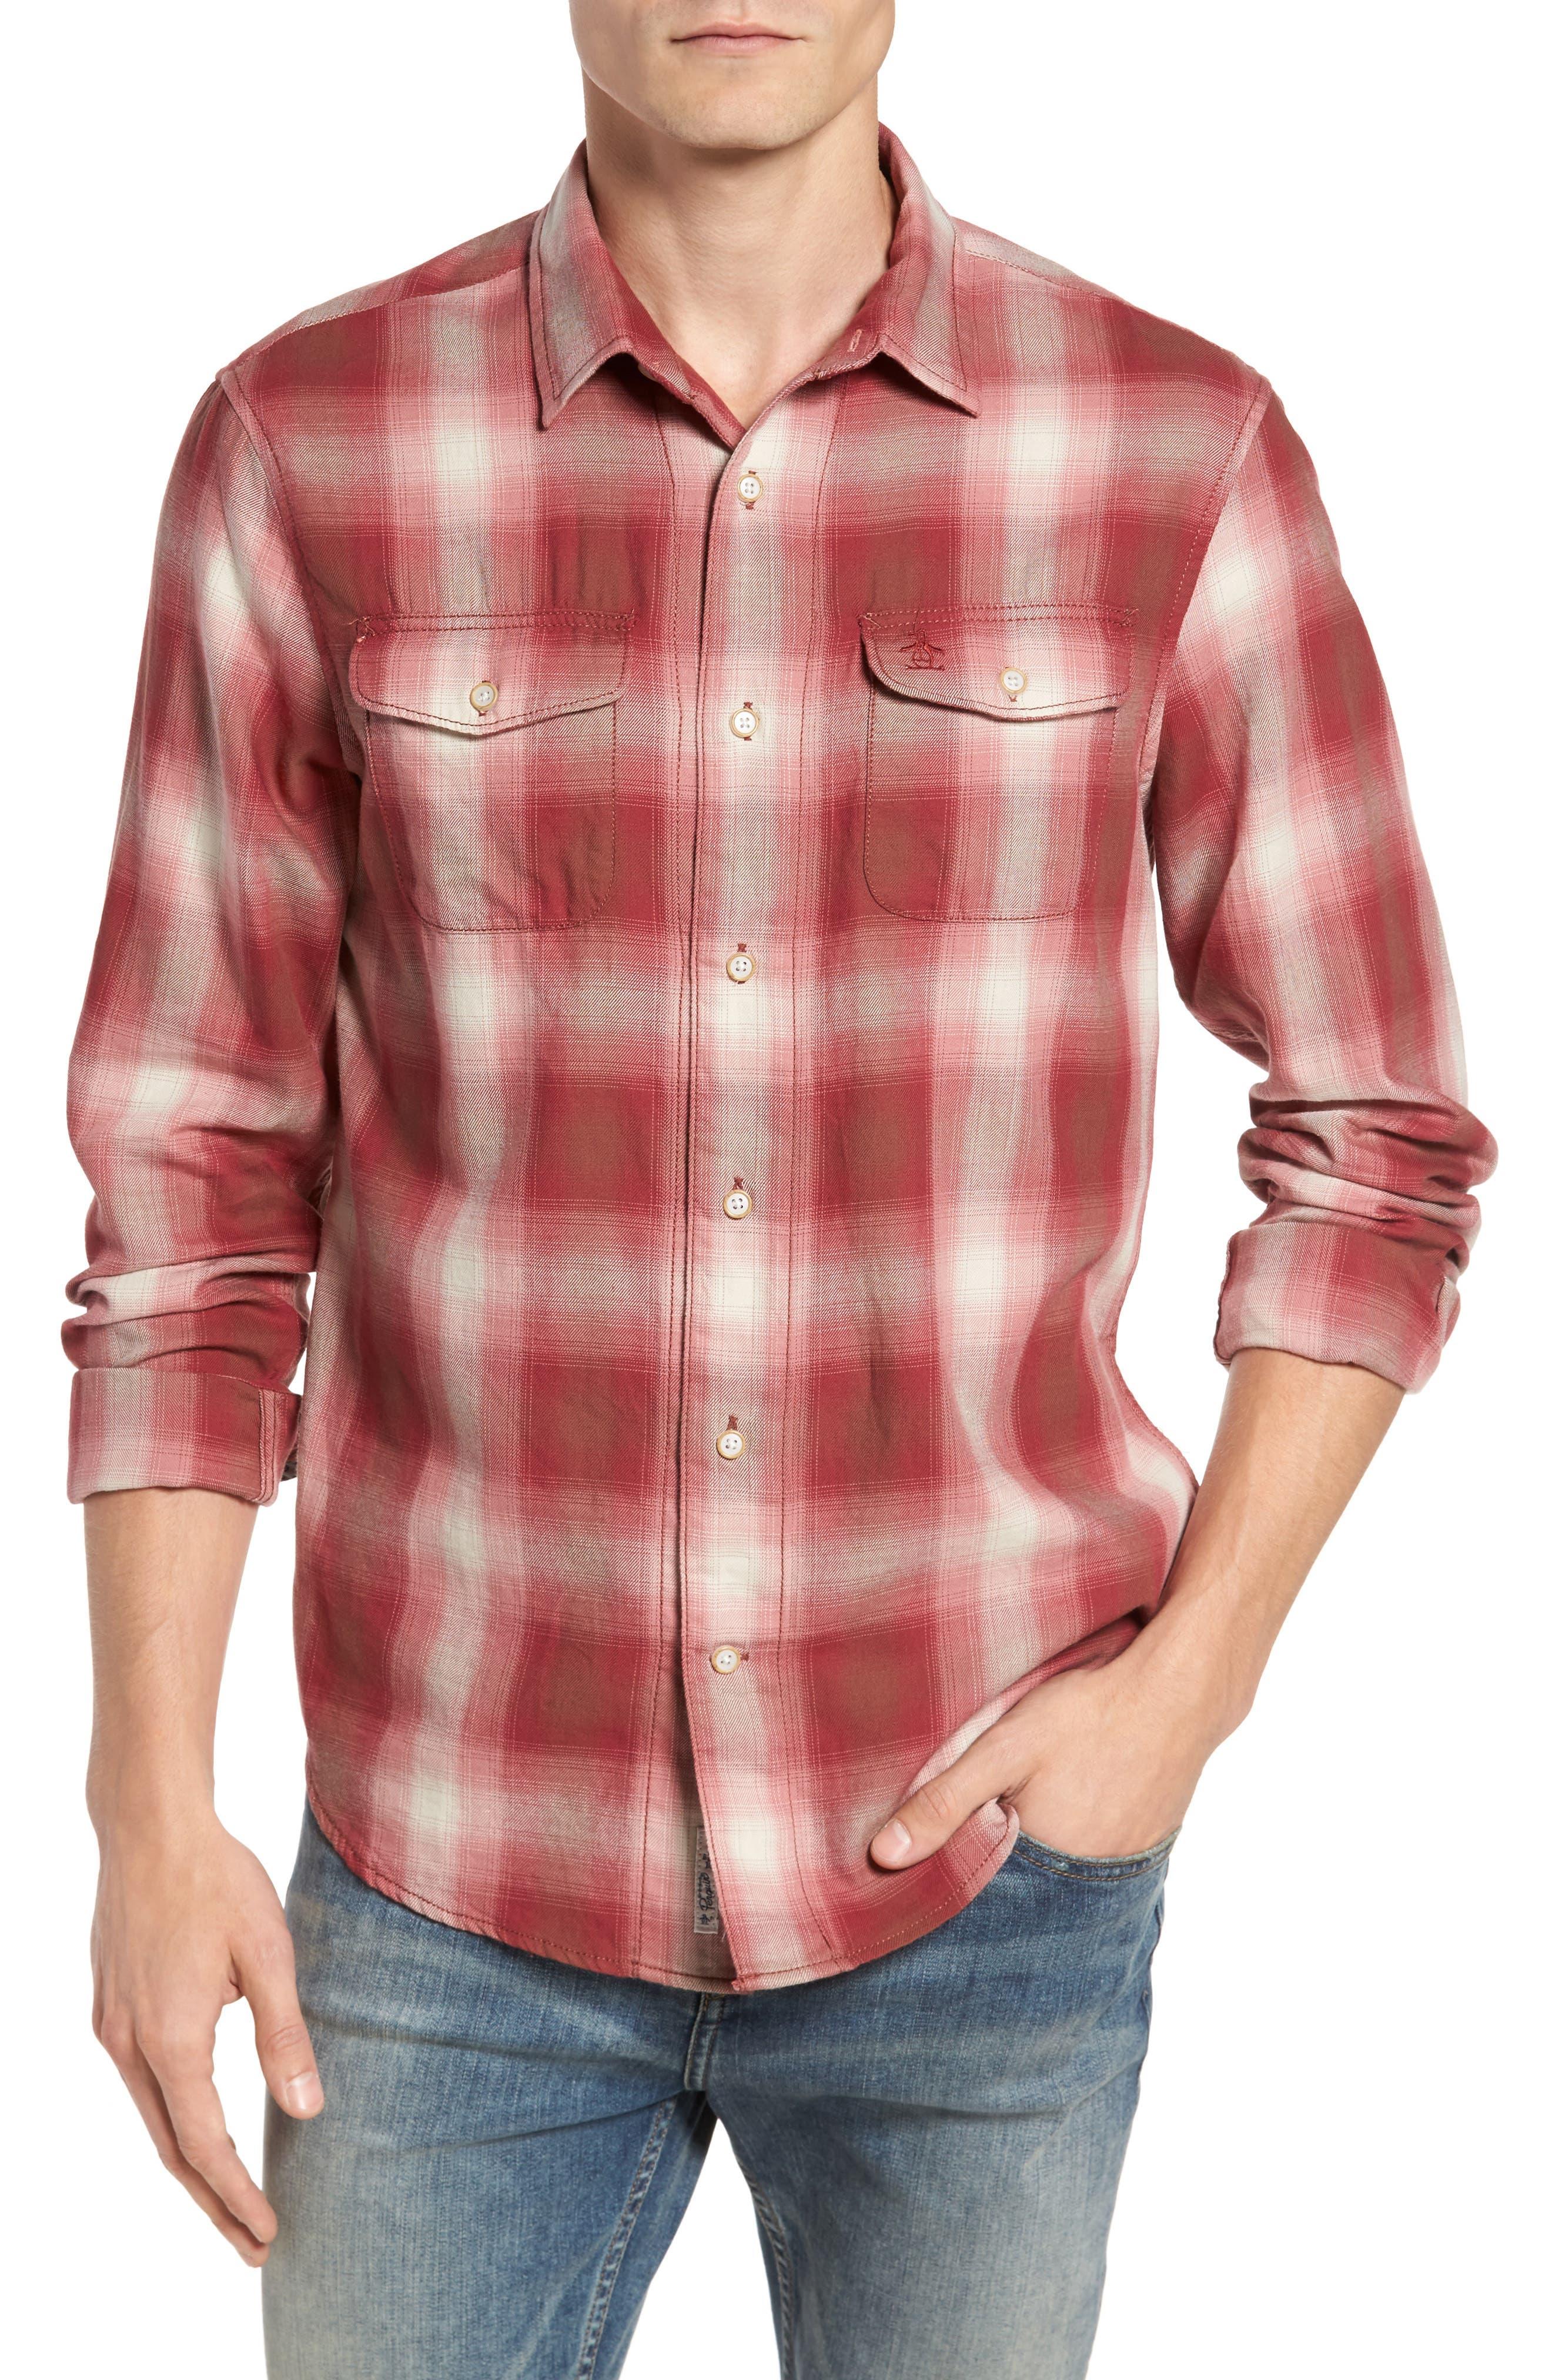 90s Plaid Flannel Shirt,                             Main thumbnail 1, color,                             643